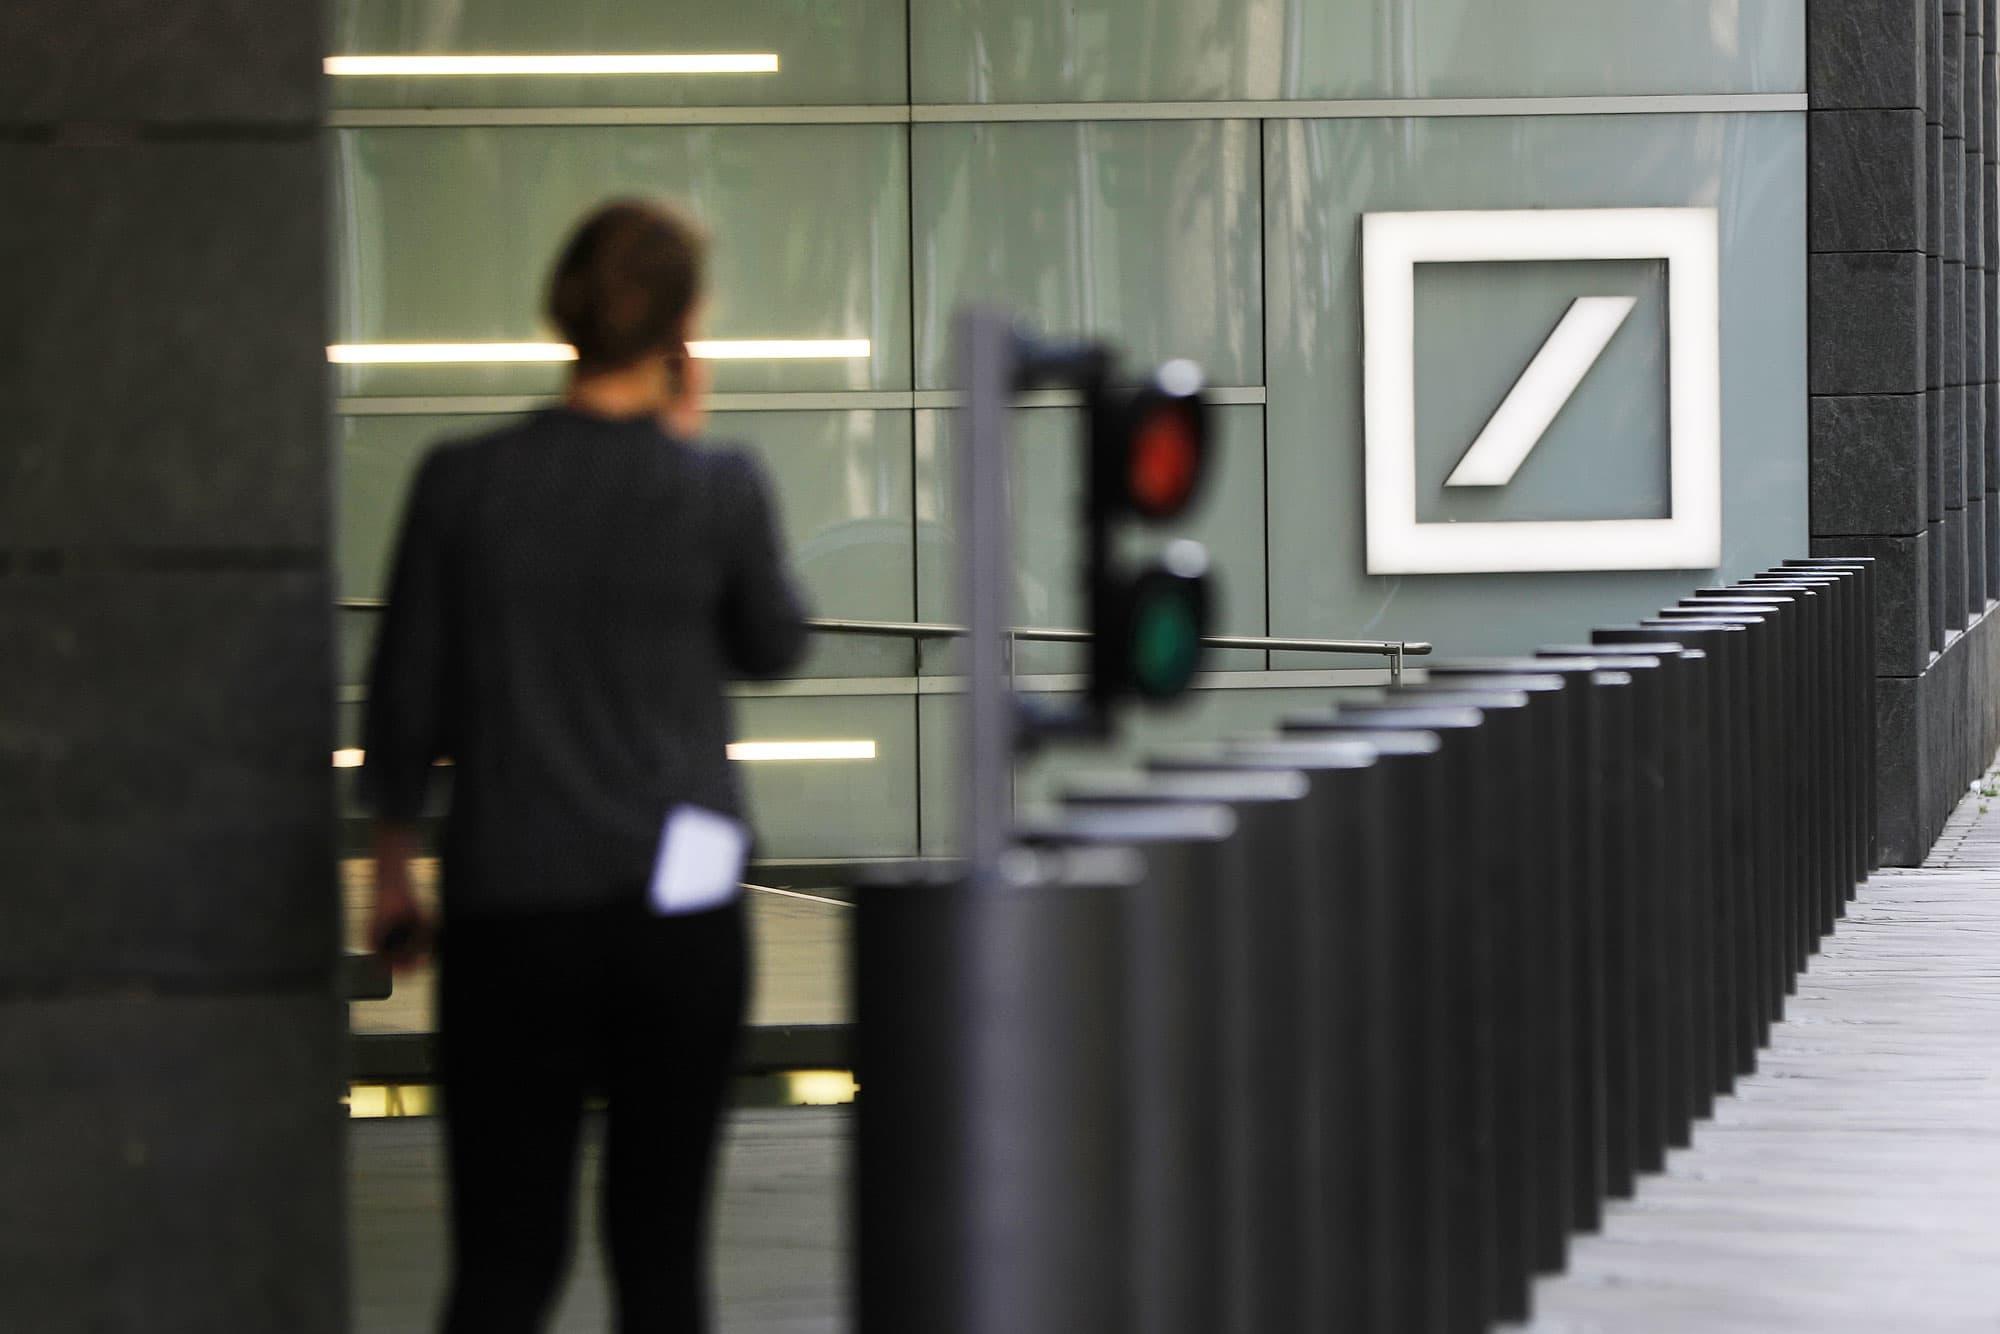 Deutsche Bank shares slump more than 5% as lender gets ready for major overhaul